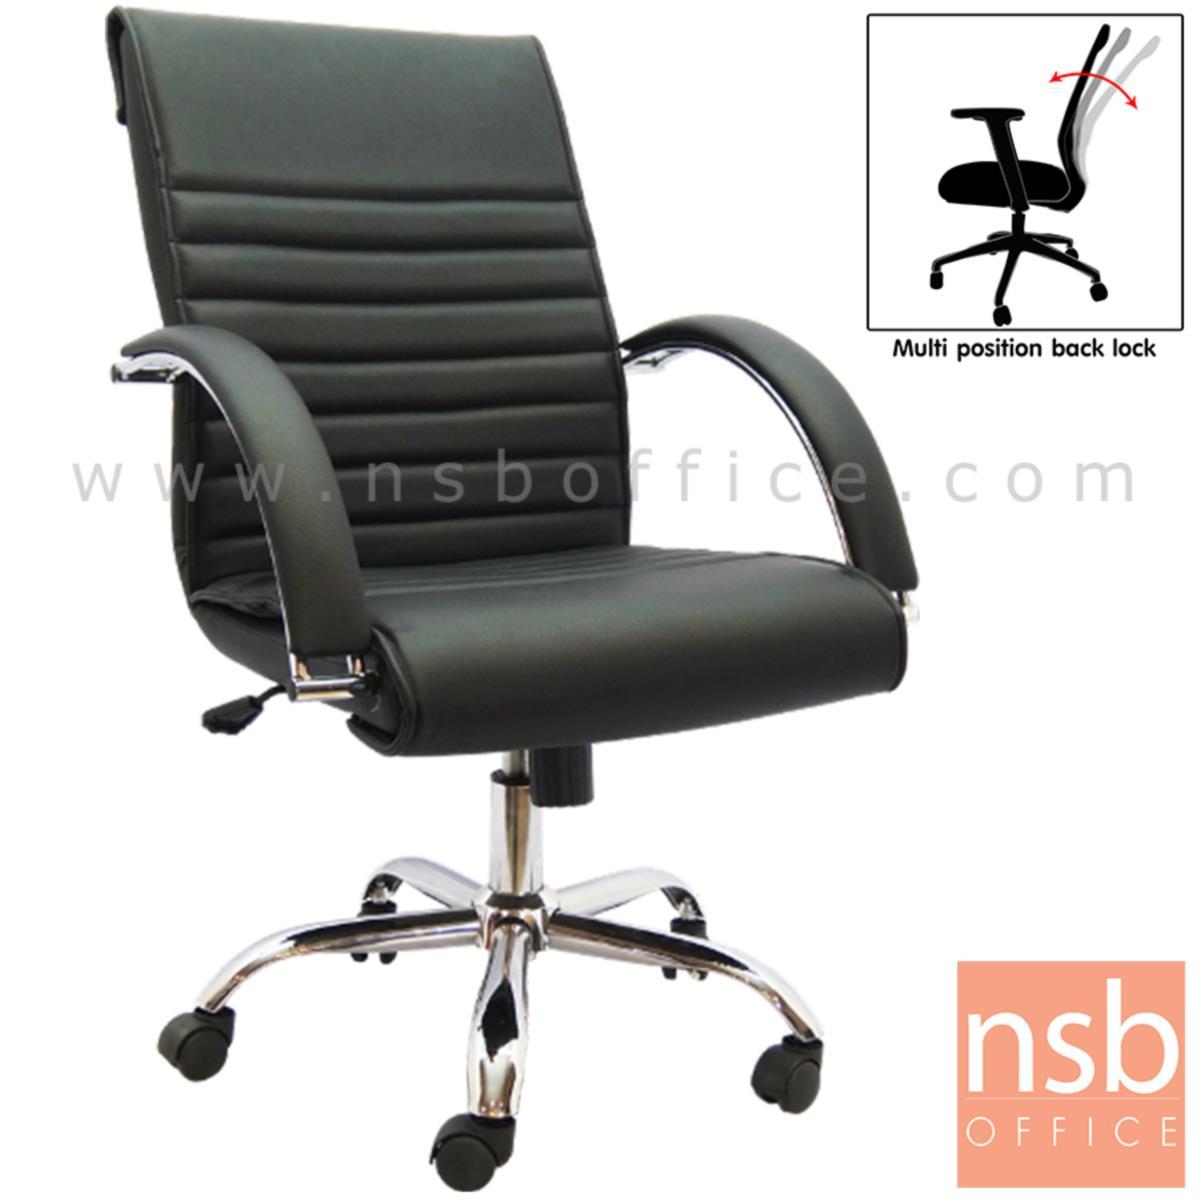 B01A178:เก้าอี้หัวหน้างาน รุ่น Mancini (แมนซินี) โช๊คแก๊ส มีก้อนโยก